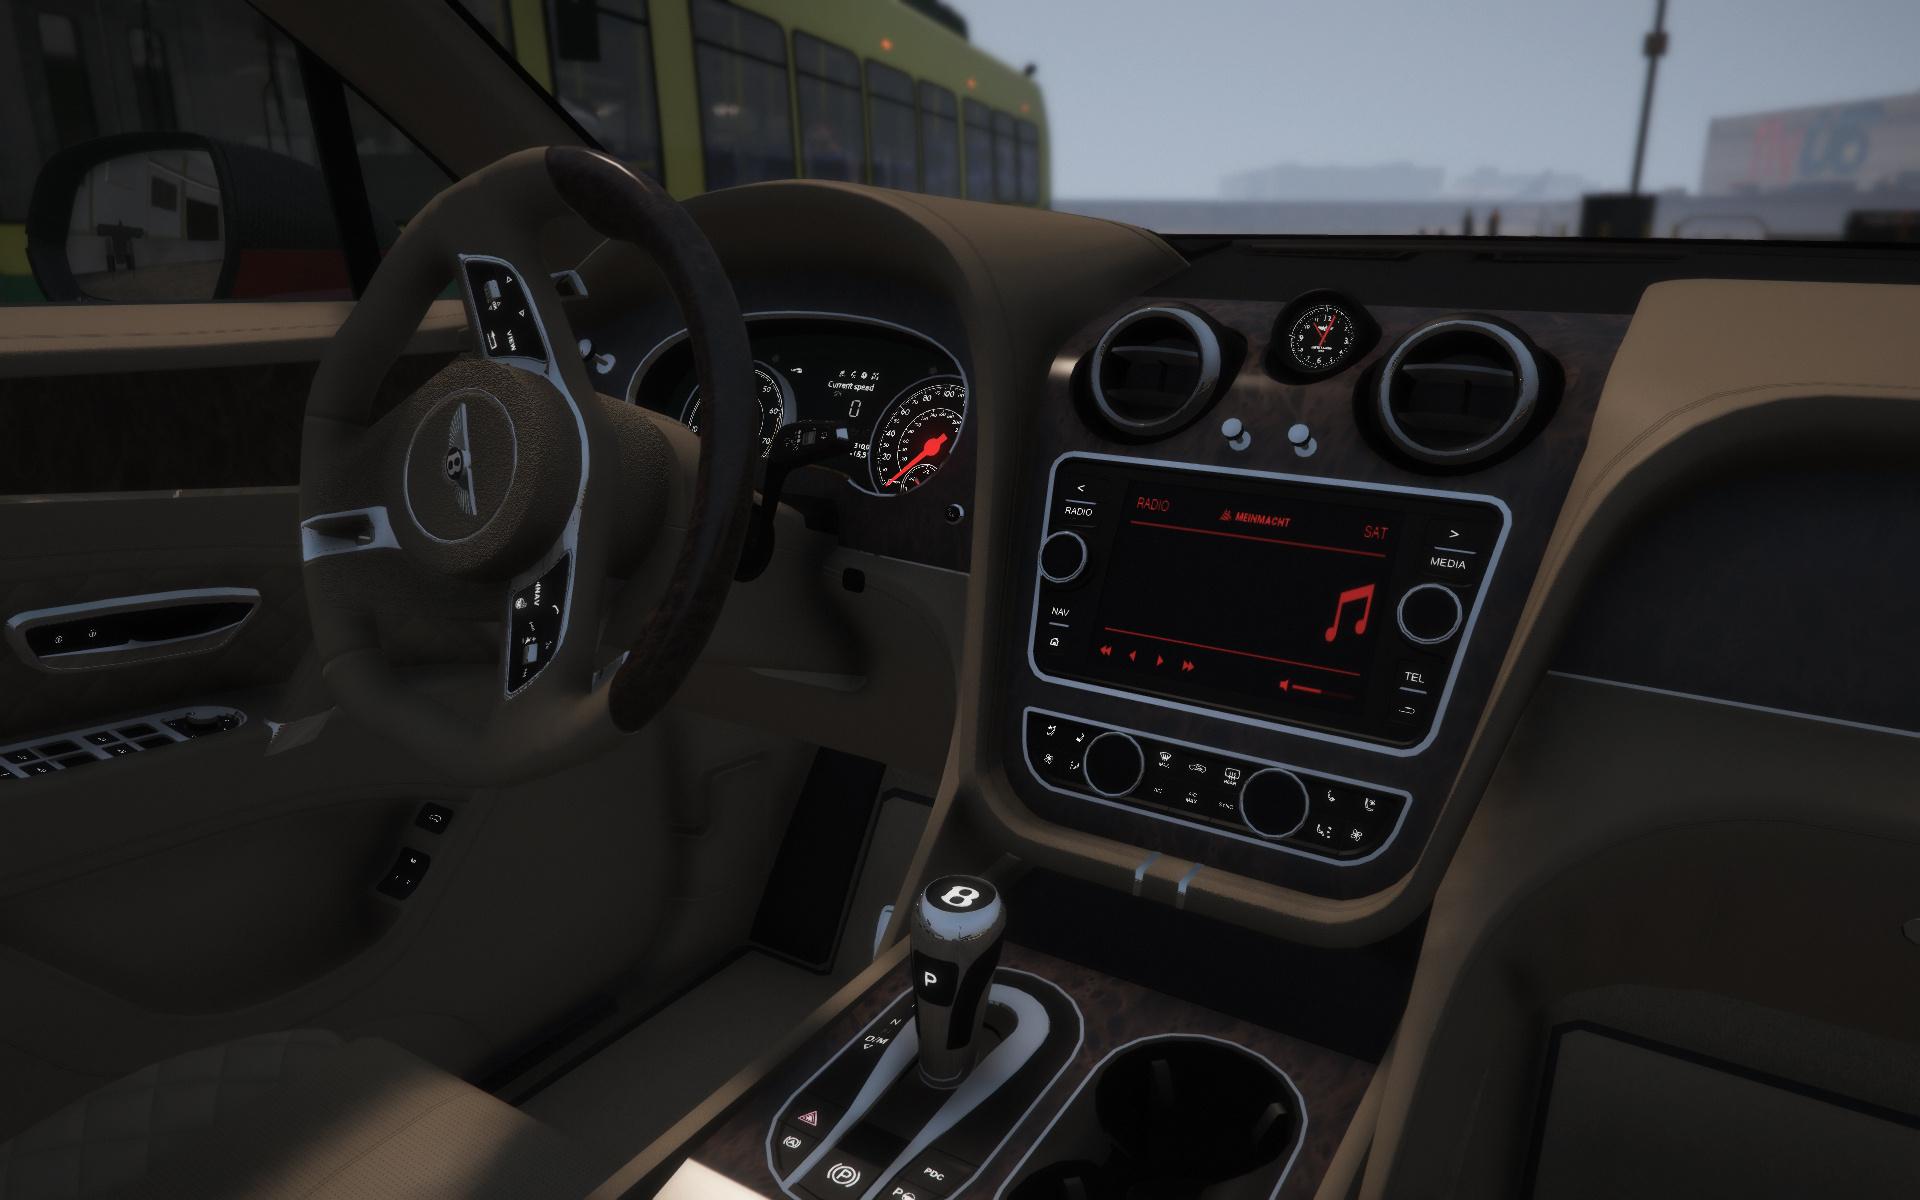 2017 Bentley Bentayga Mansory Add On Tuning Analog Digital Dials Gta5 Mods Com